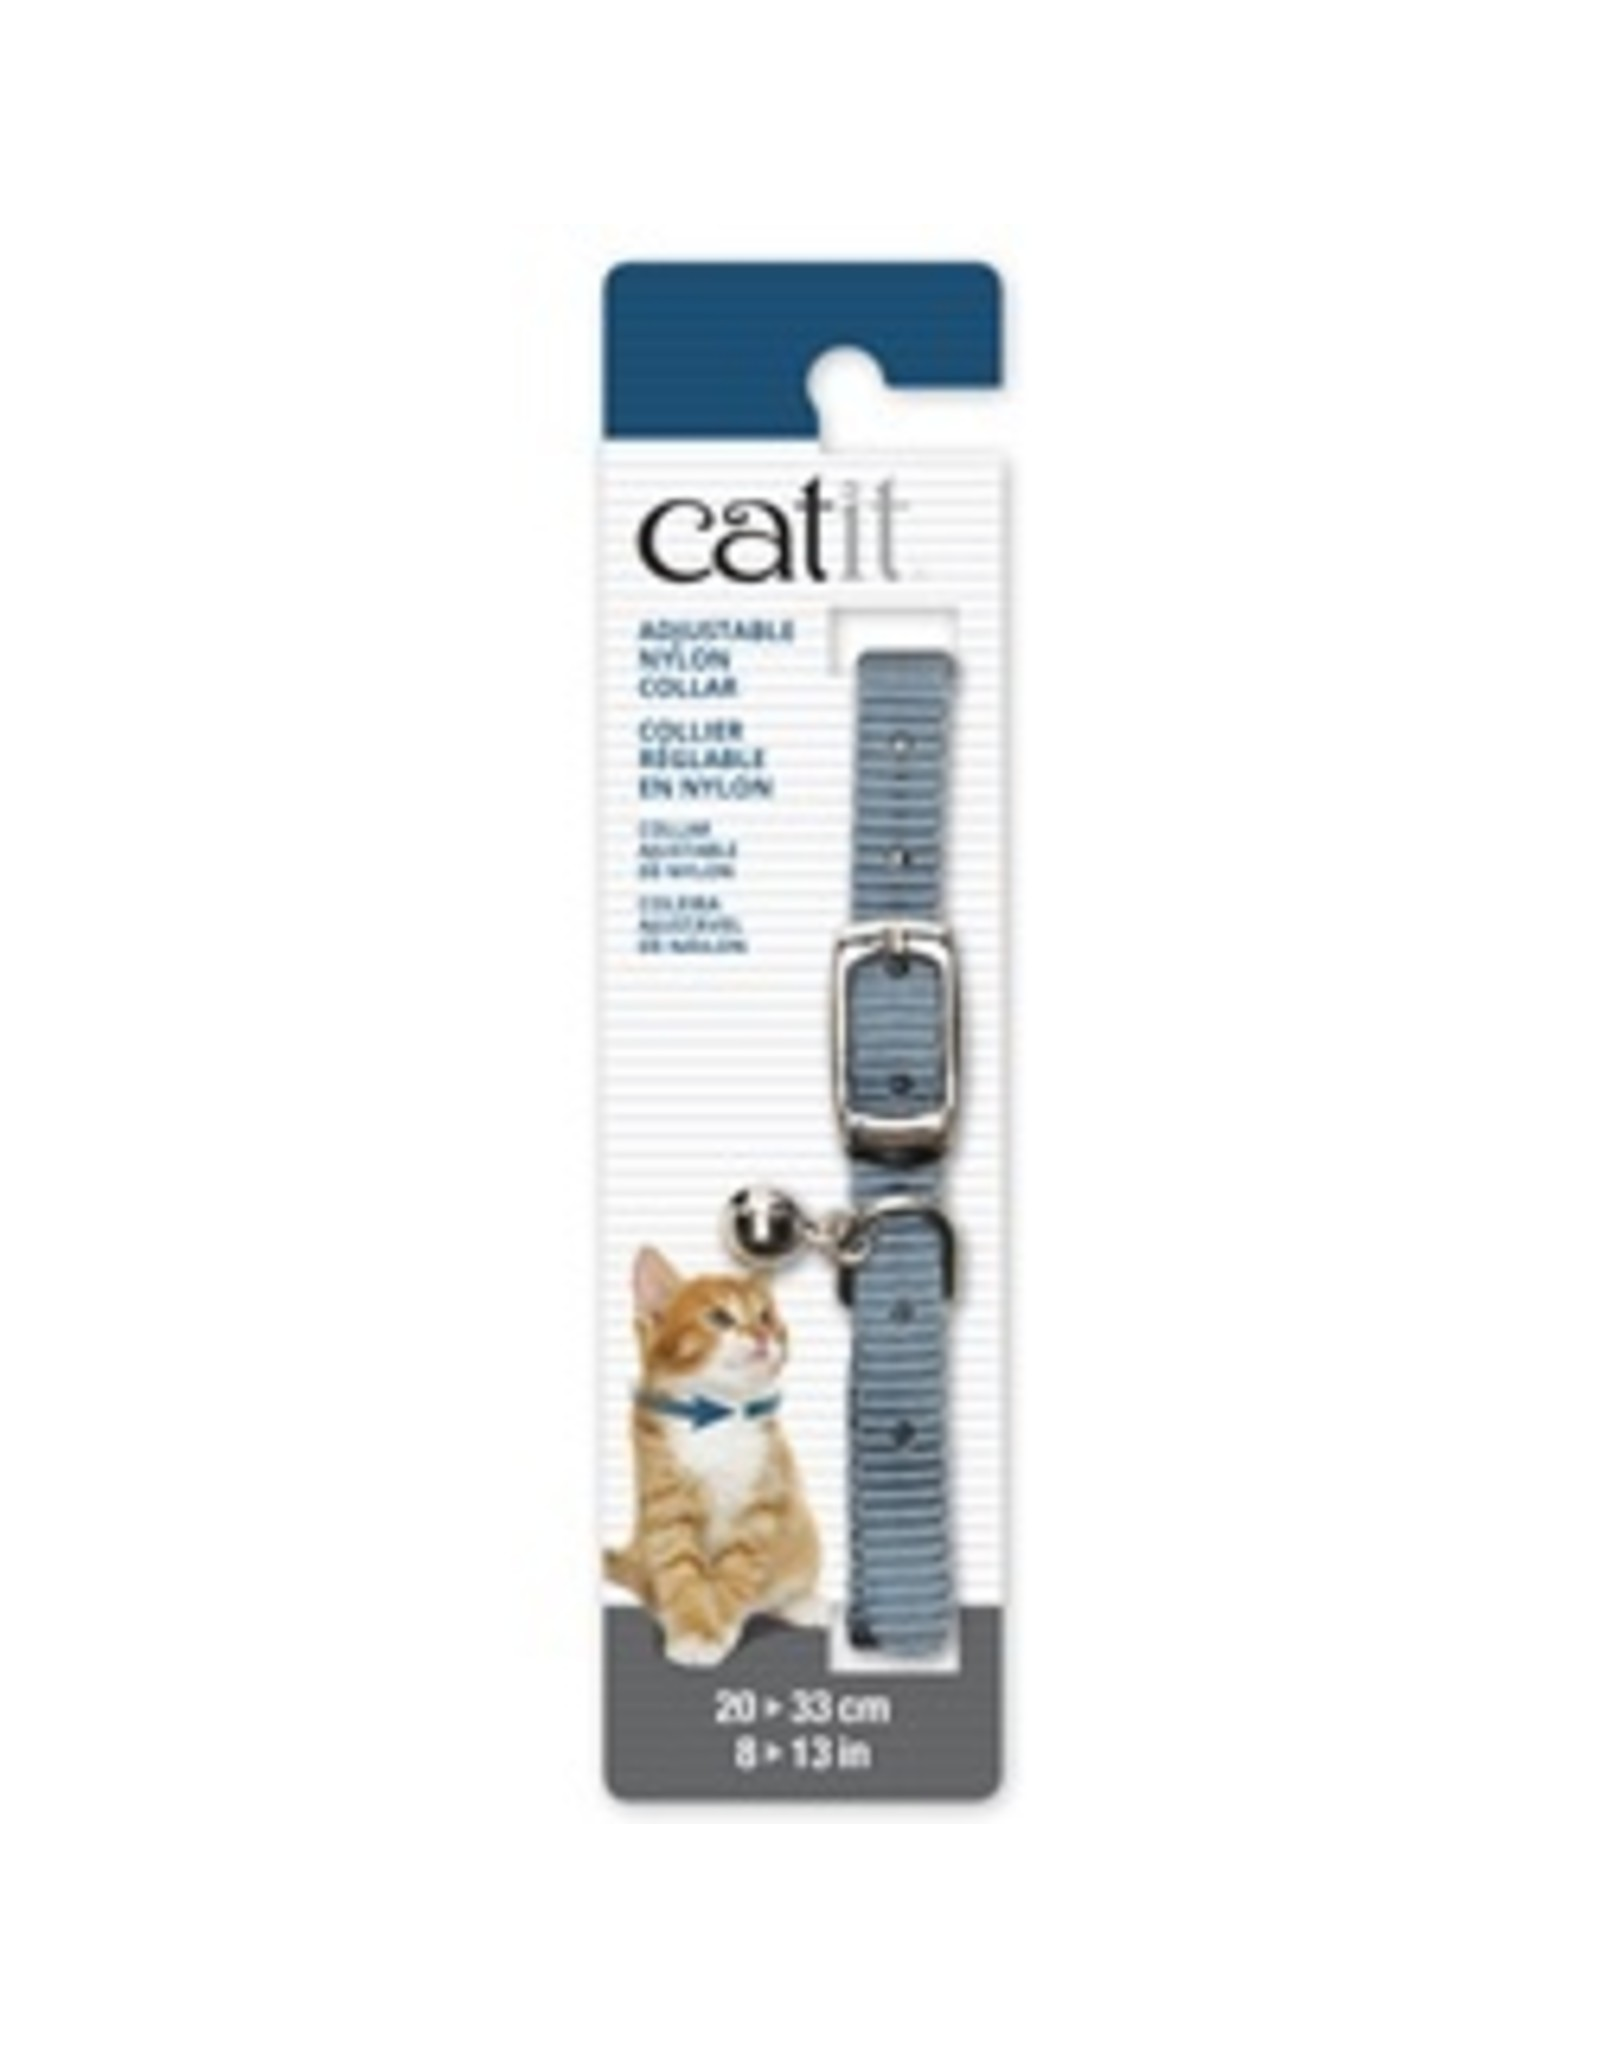 "CatIt Adjustable Nylon Cat Collar  20-33cm (8-13"")"